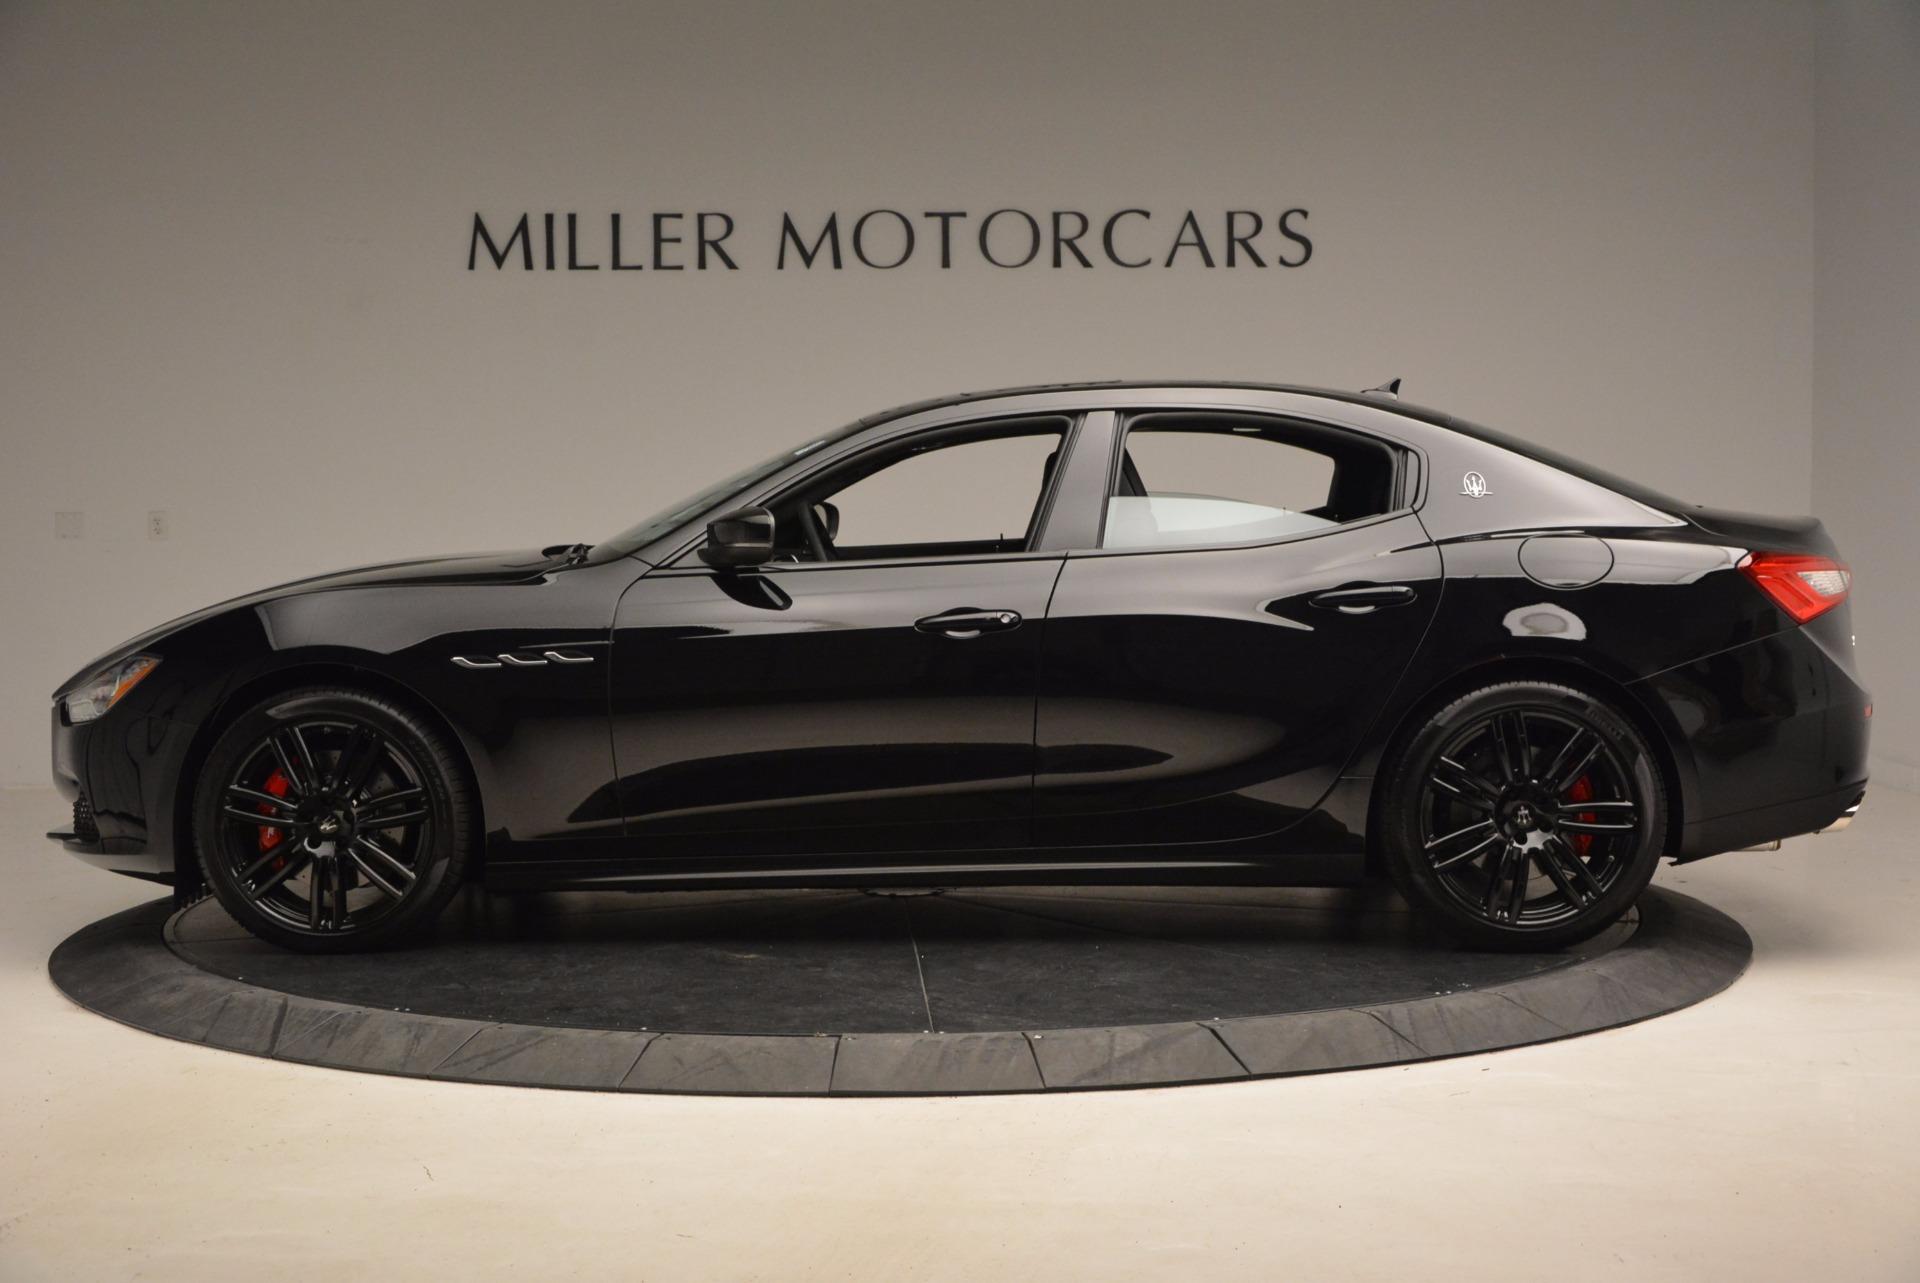 New 2017 Maserati Ghibli Nerissimo Edition S Q4 For Sale In Westport, CT 1419_p3